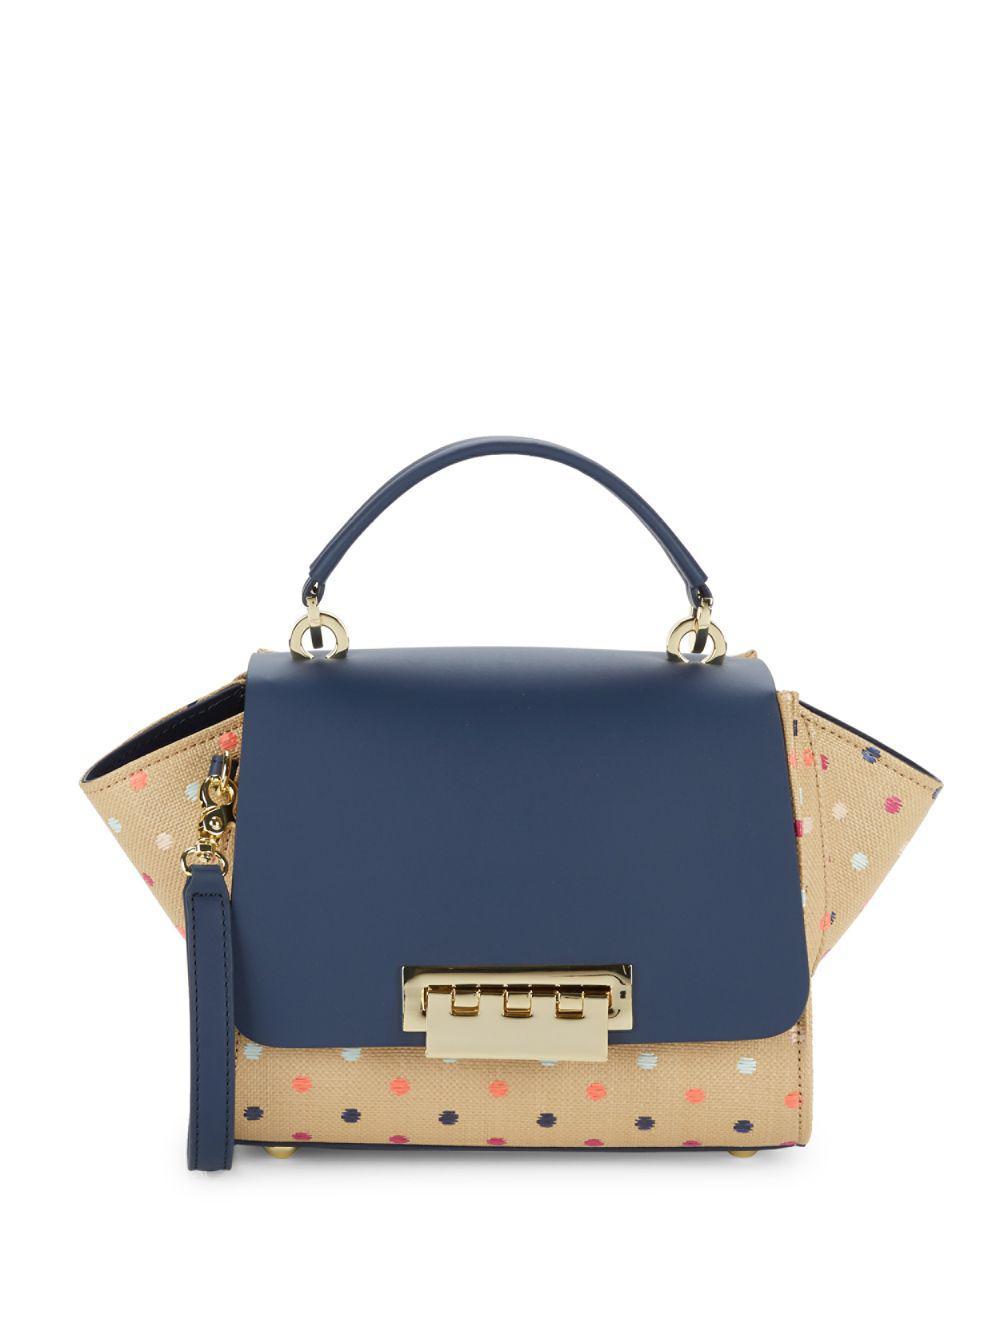 742e05f2b1 Zac Zac Posen Eartha Leather Top Handle Crossbody Bag in Blue - Lyst